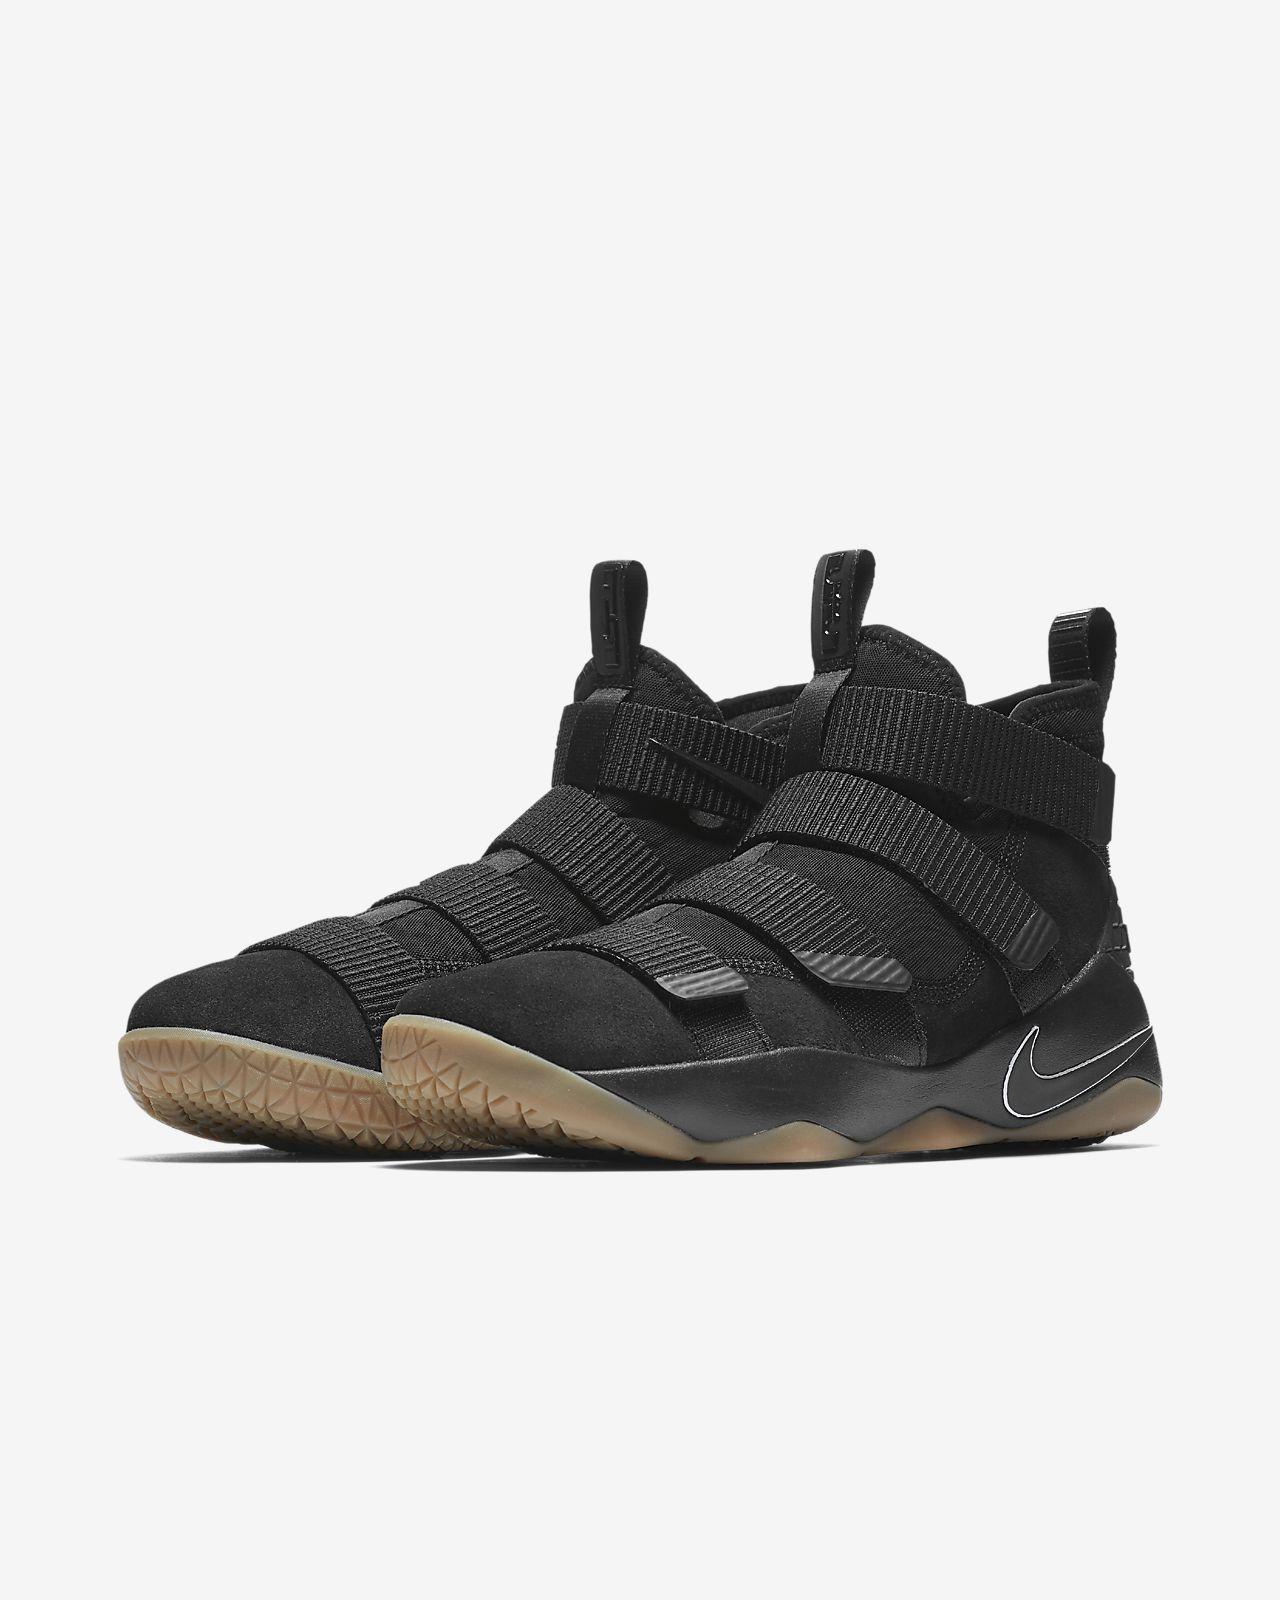 38db308ac4a1 ... low resolution lebron soldier xi basketball shoe lebron soldier xi  basketball shoe